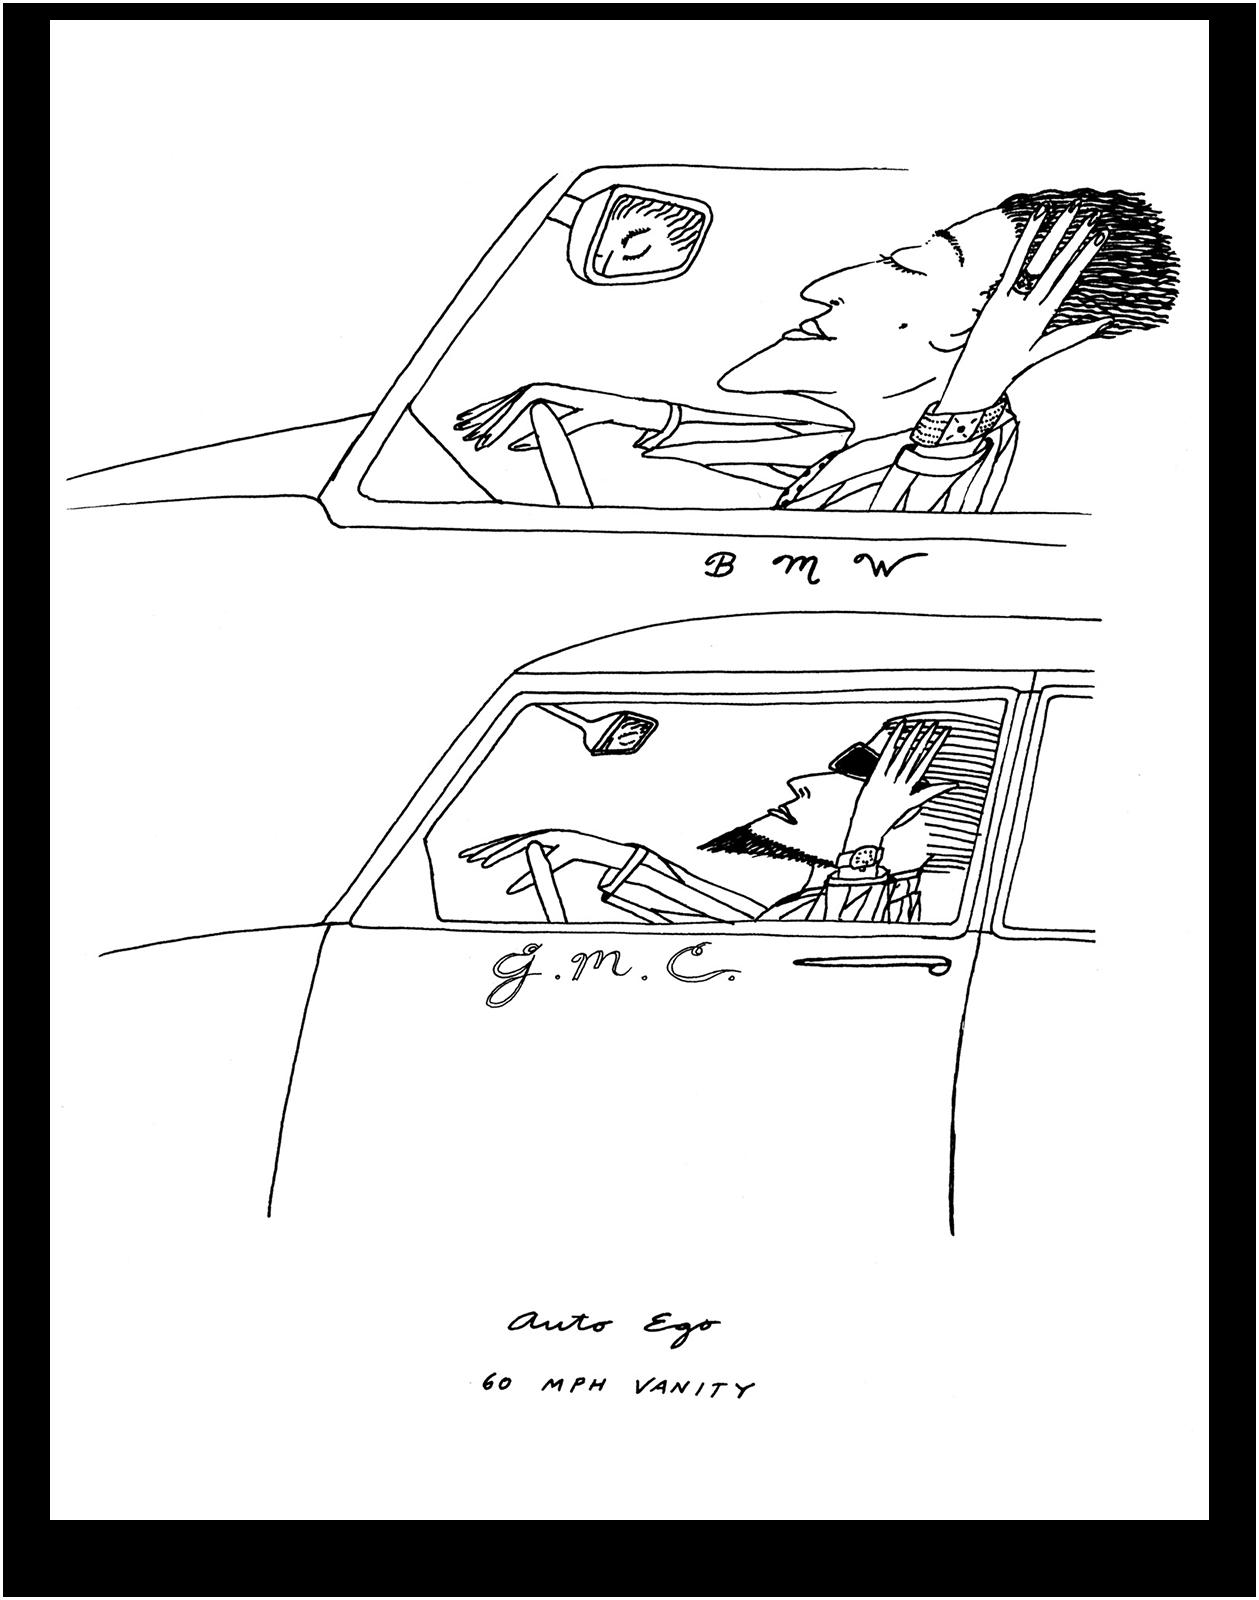 1989 Auto Ego copy.png